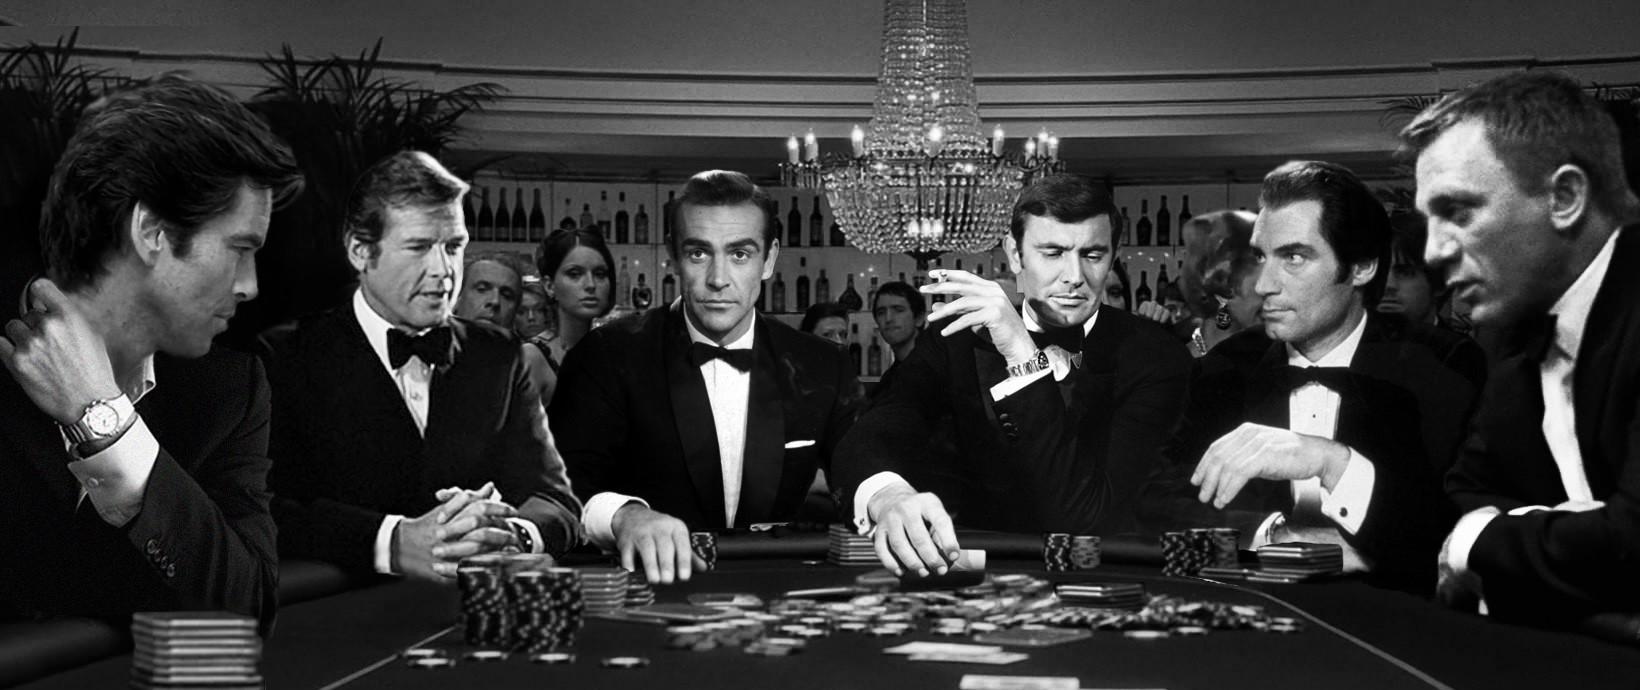 James Bond Poker Scene